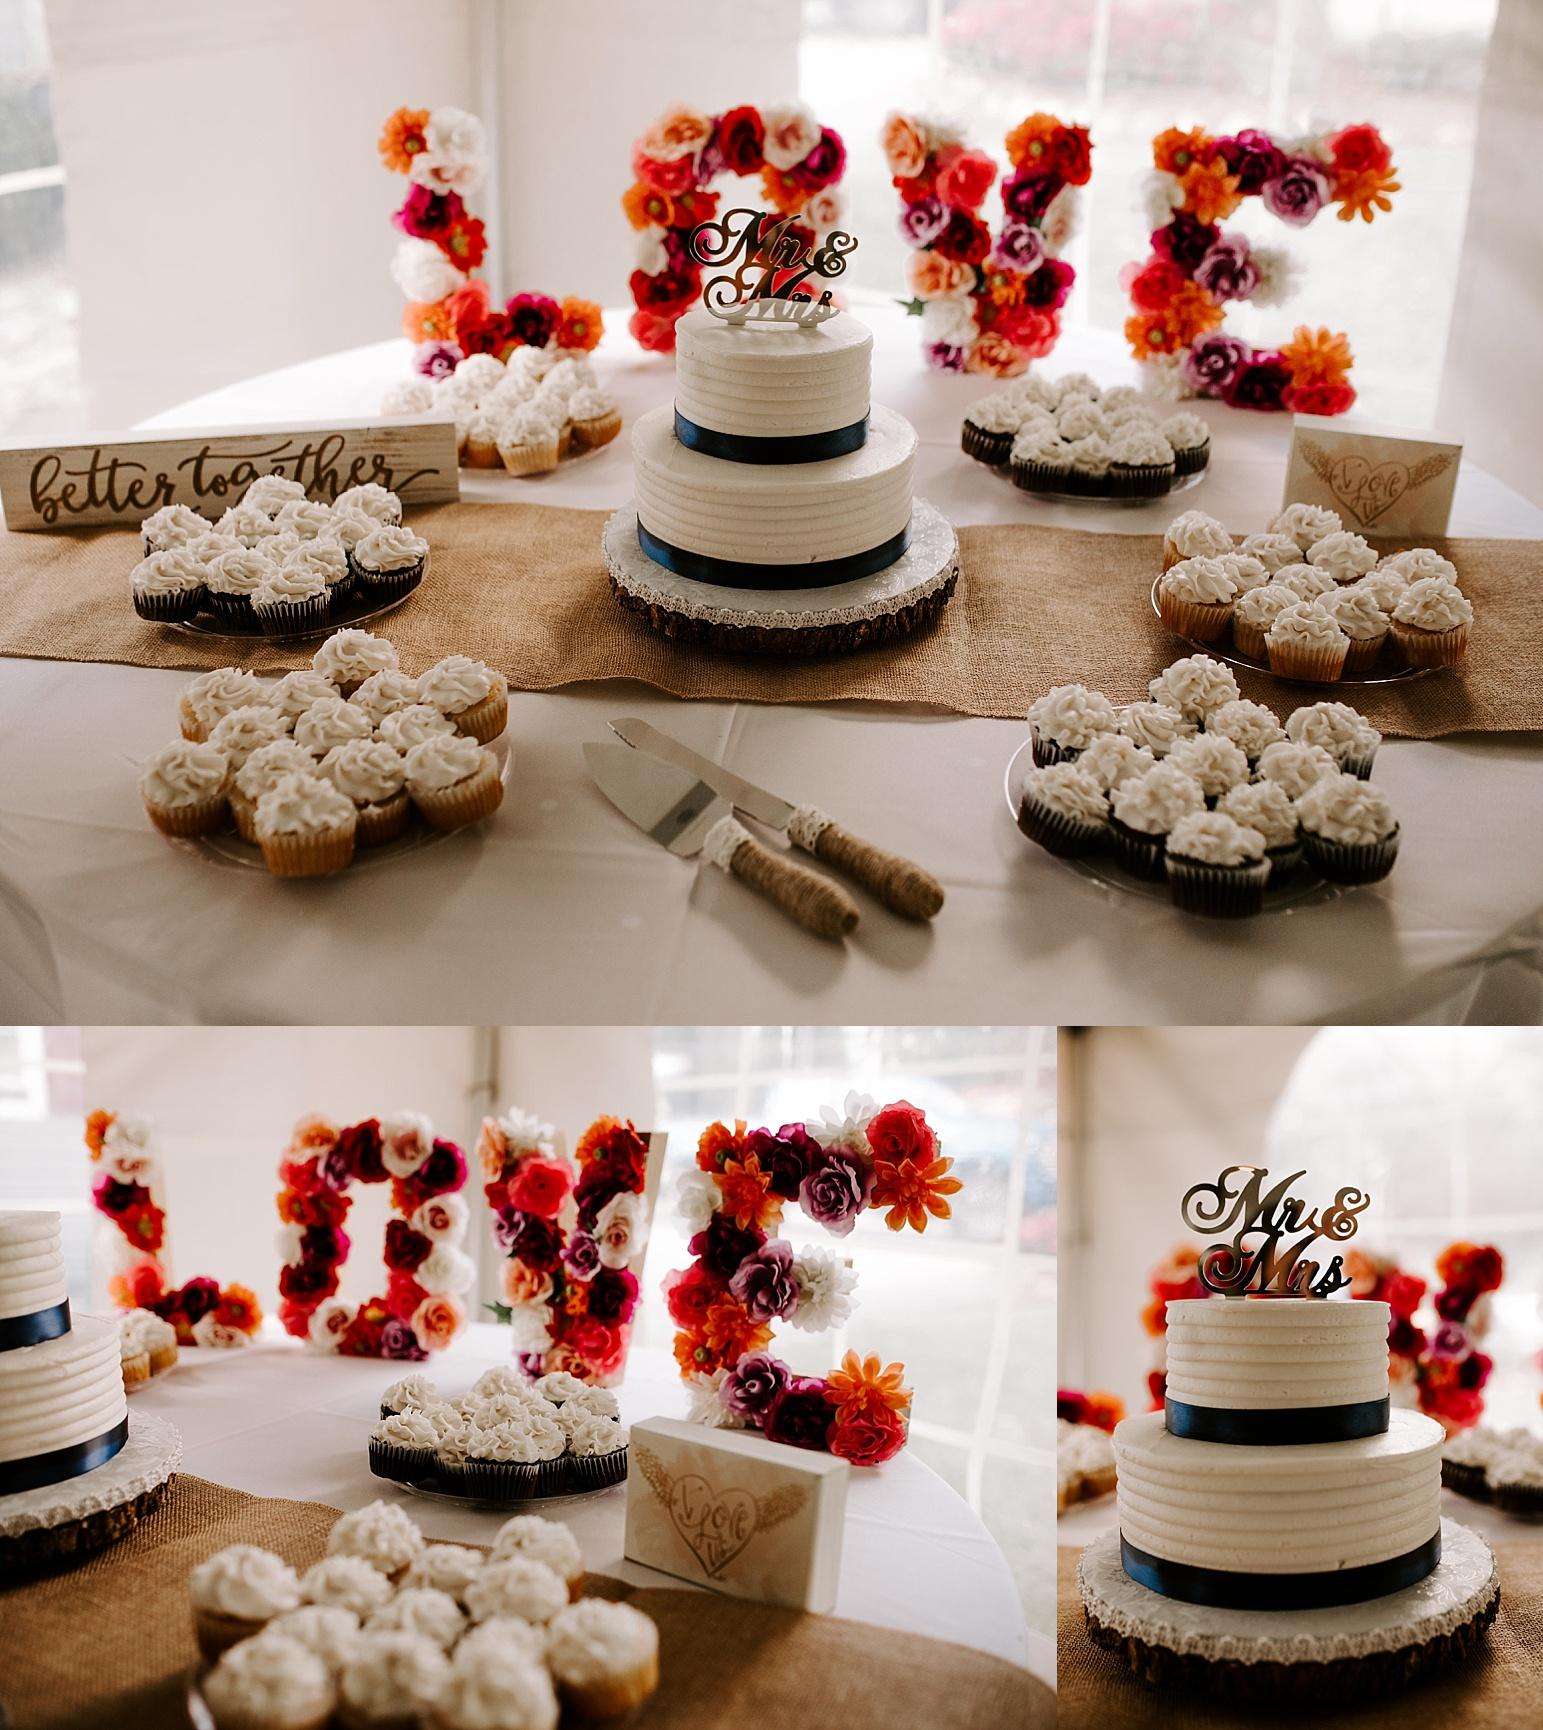 ashley_sara_photography_pittsburgh-wedding-photographer_ohio-wedding-photographer_destination-wedding-photographer43.jpg